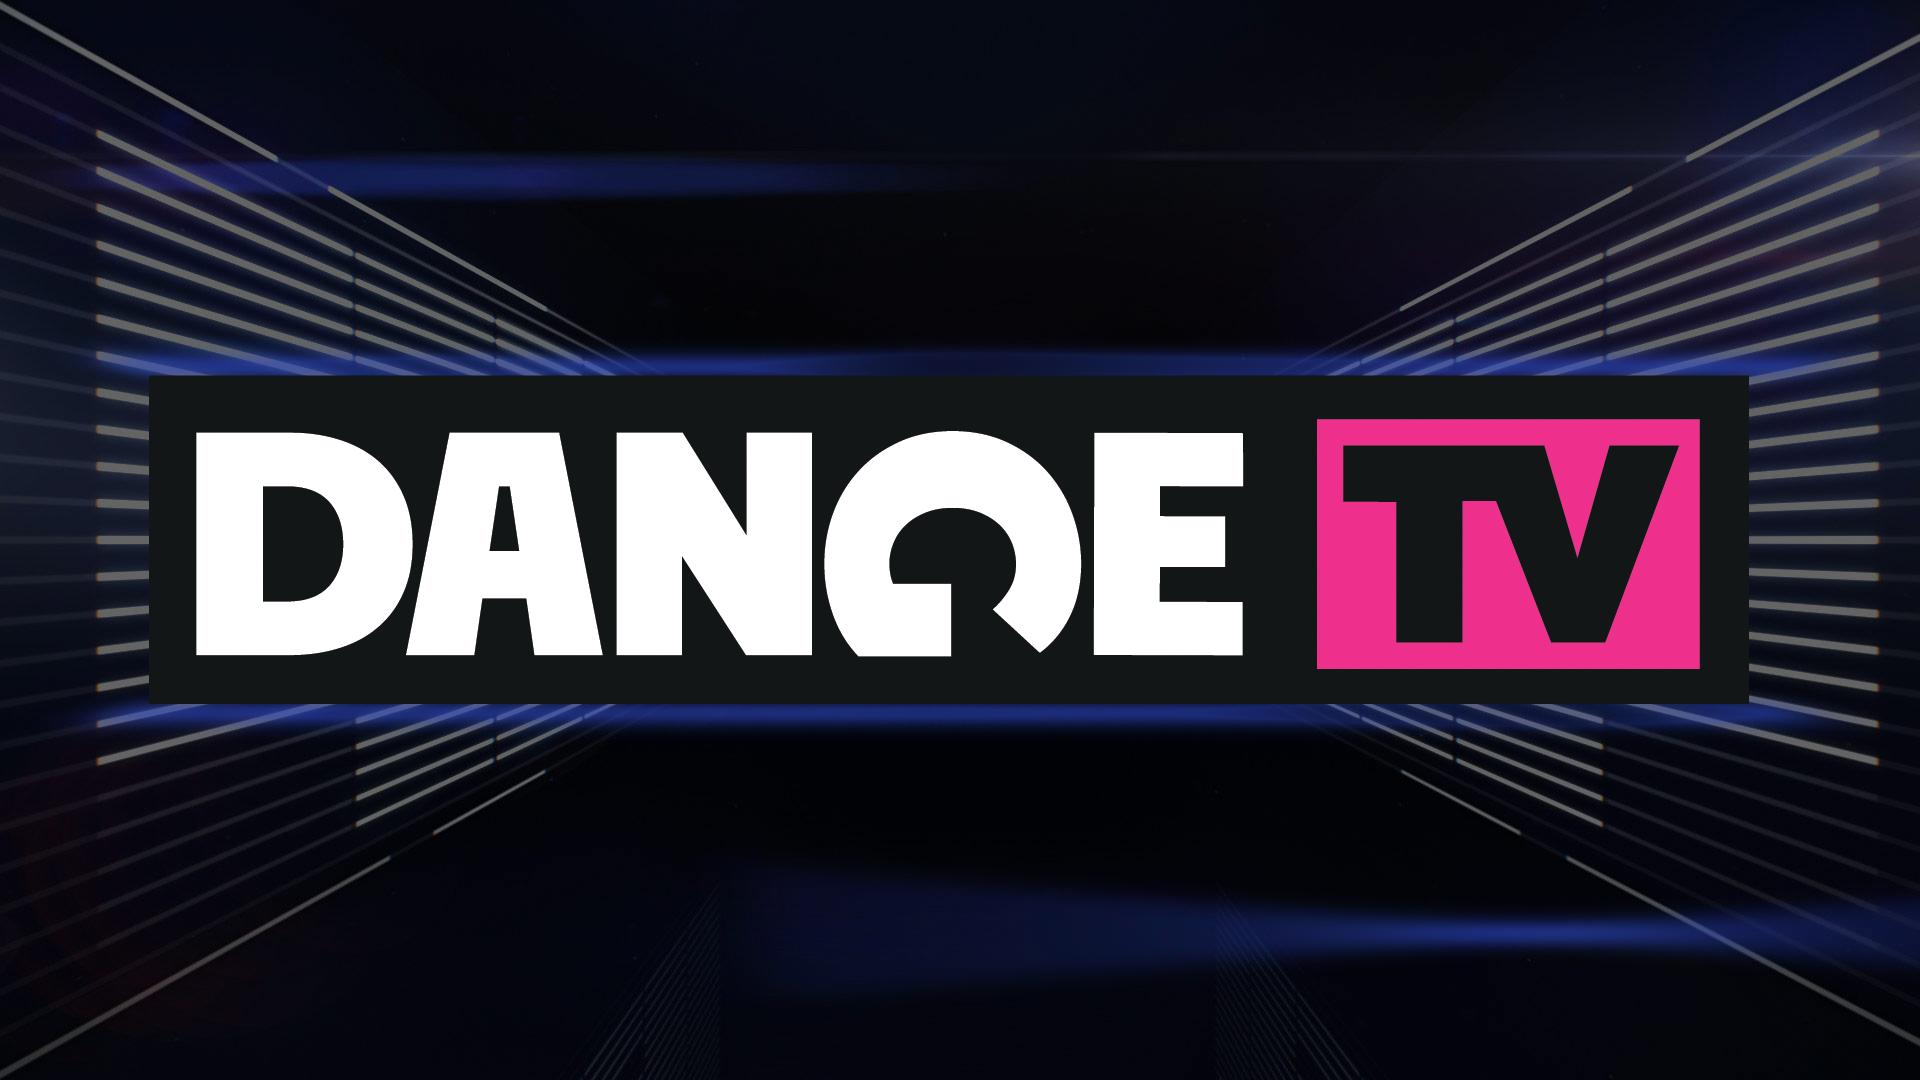 Dange TV